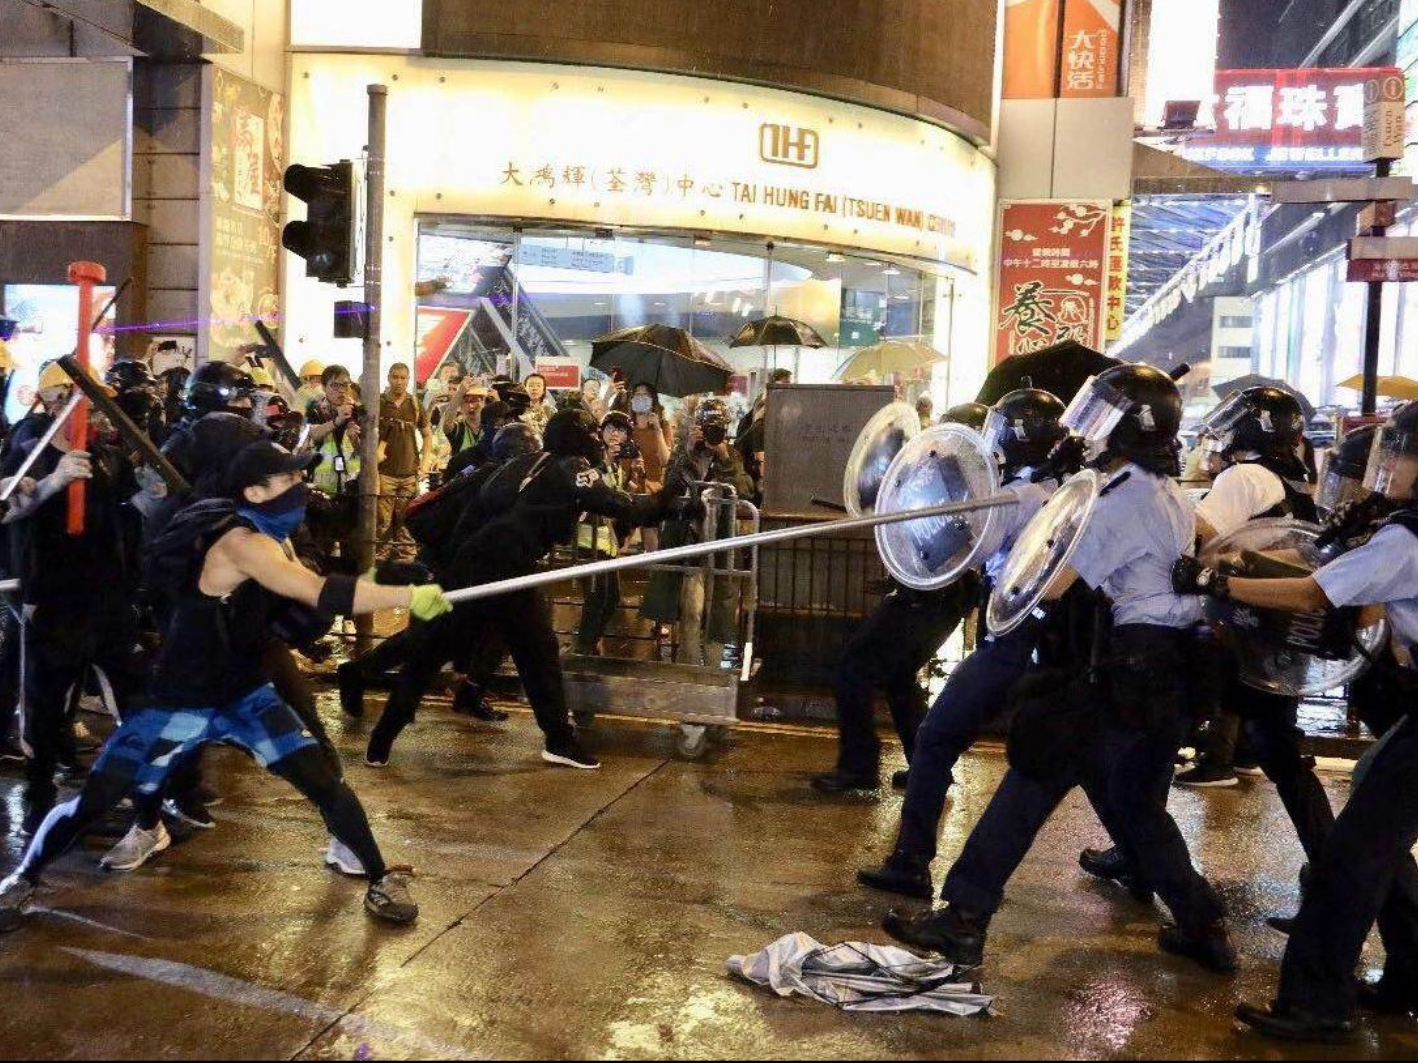 Biased media distorts HK law enforcement narrative